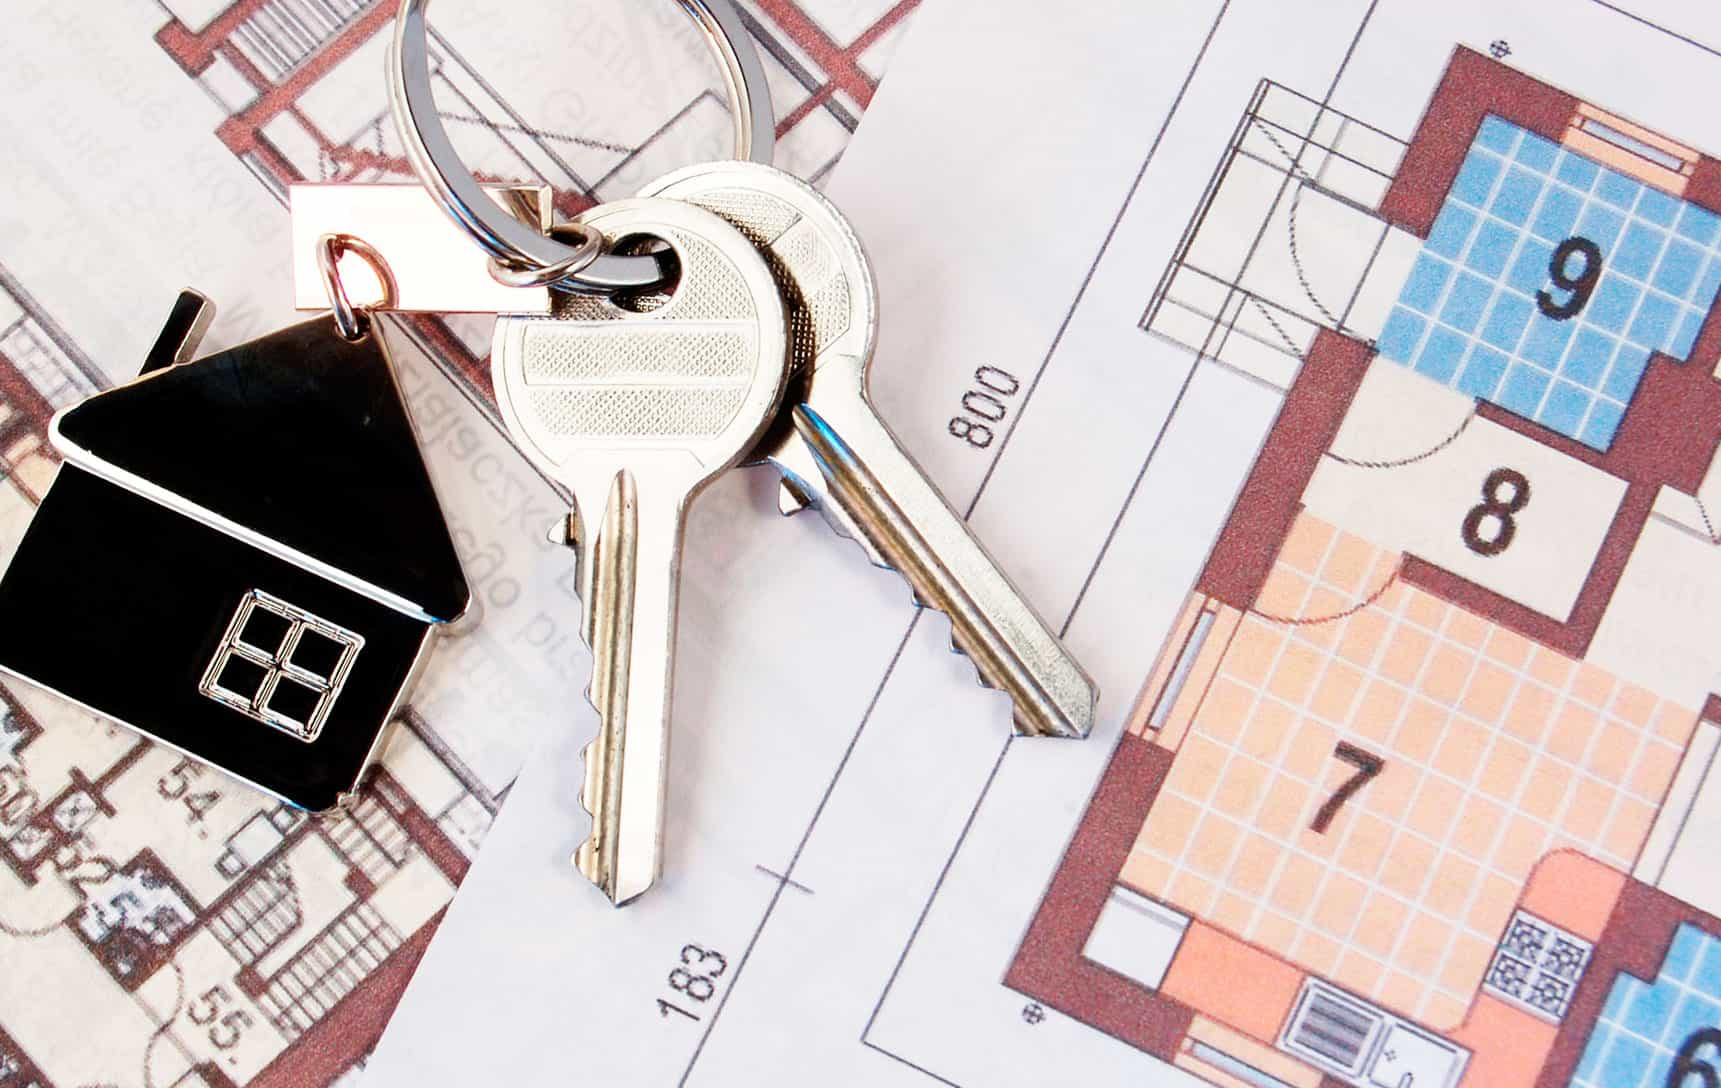 Отказ от алиментов в счет квартиры дома и другой недвижимости